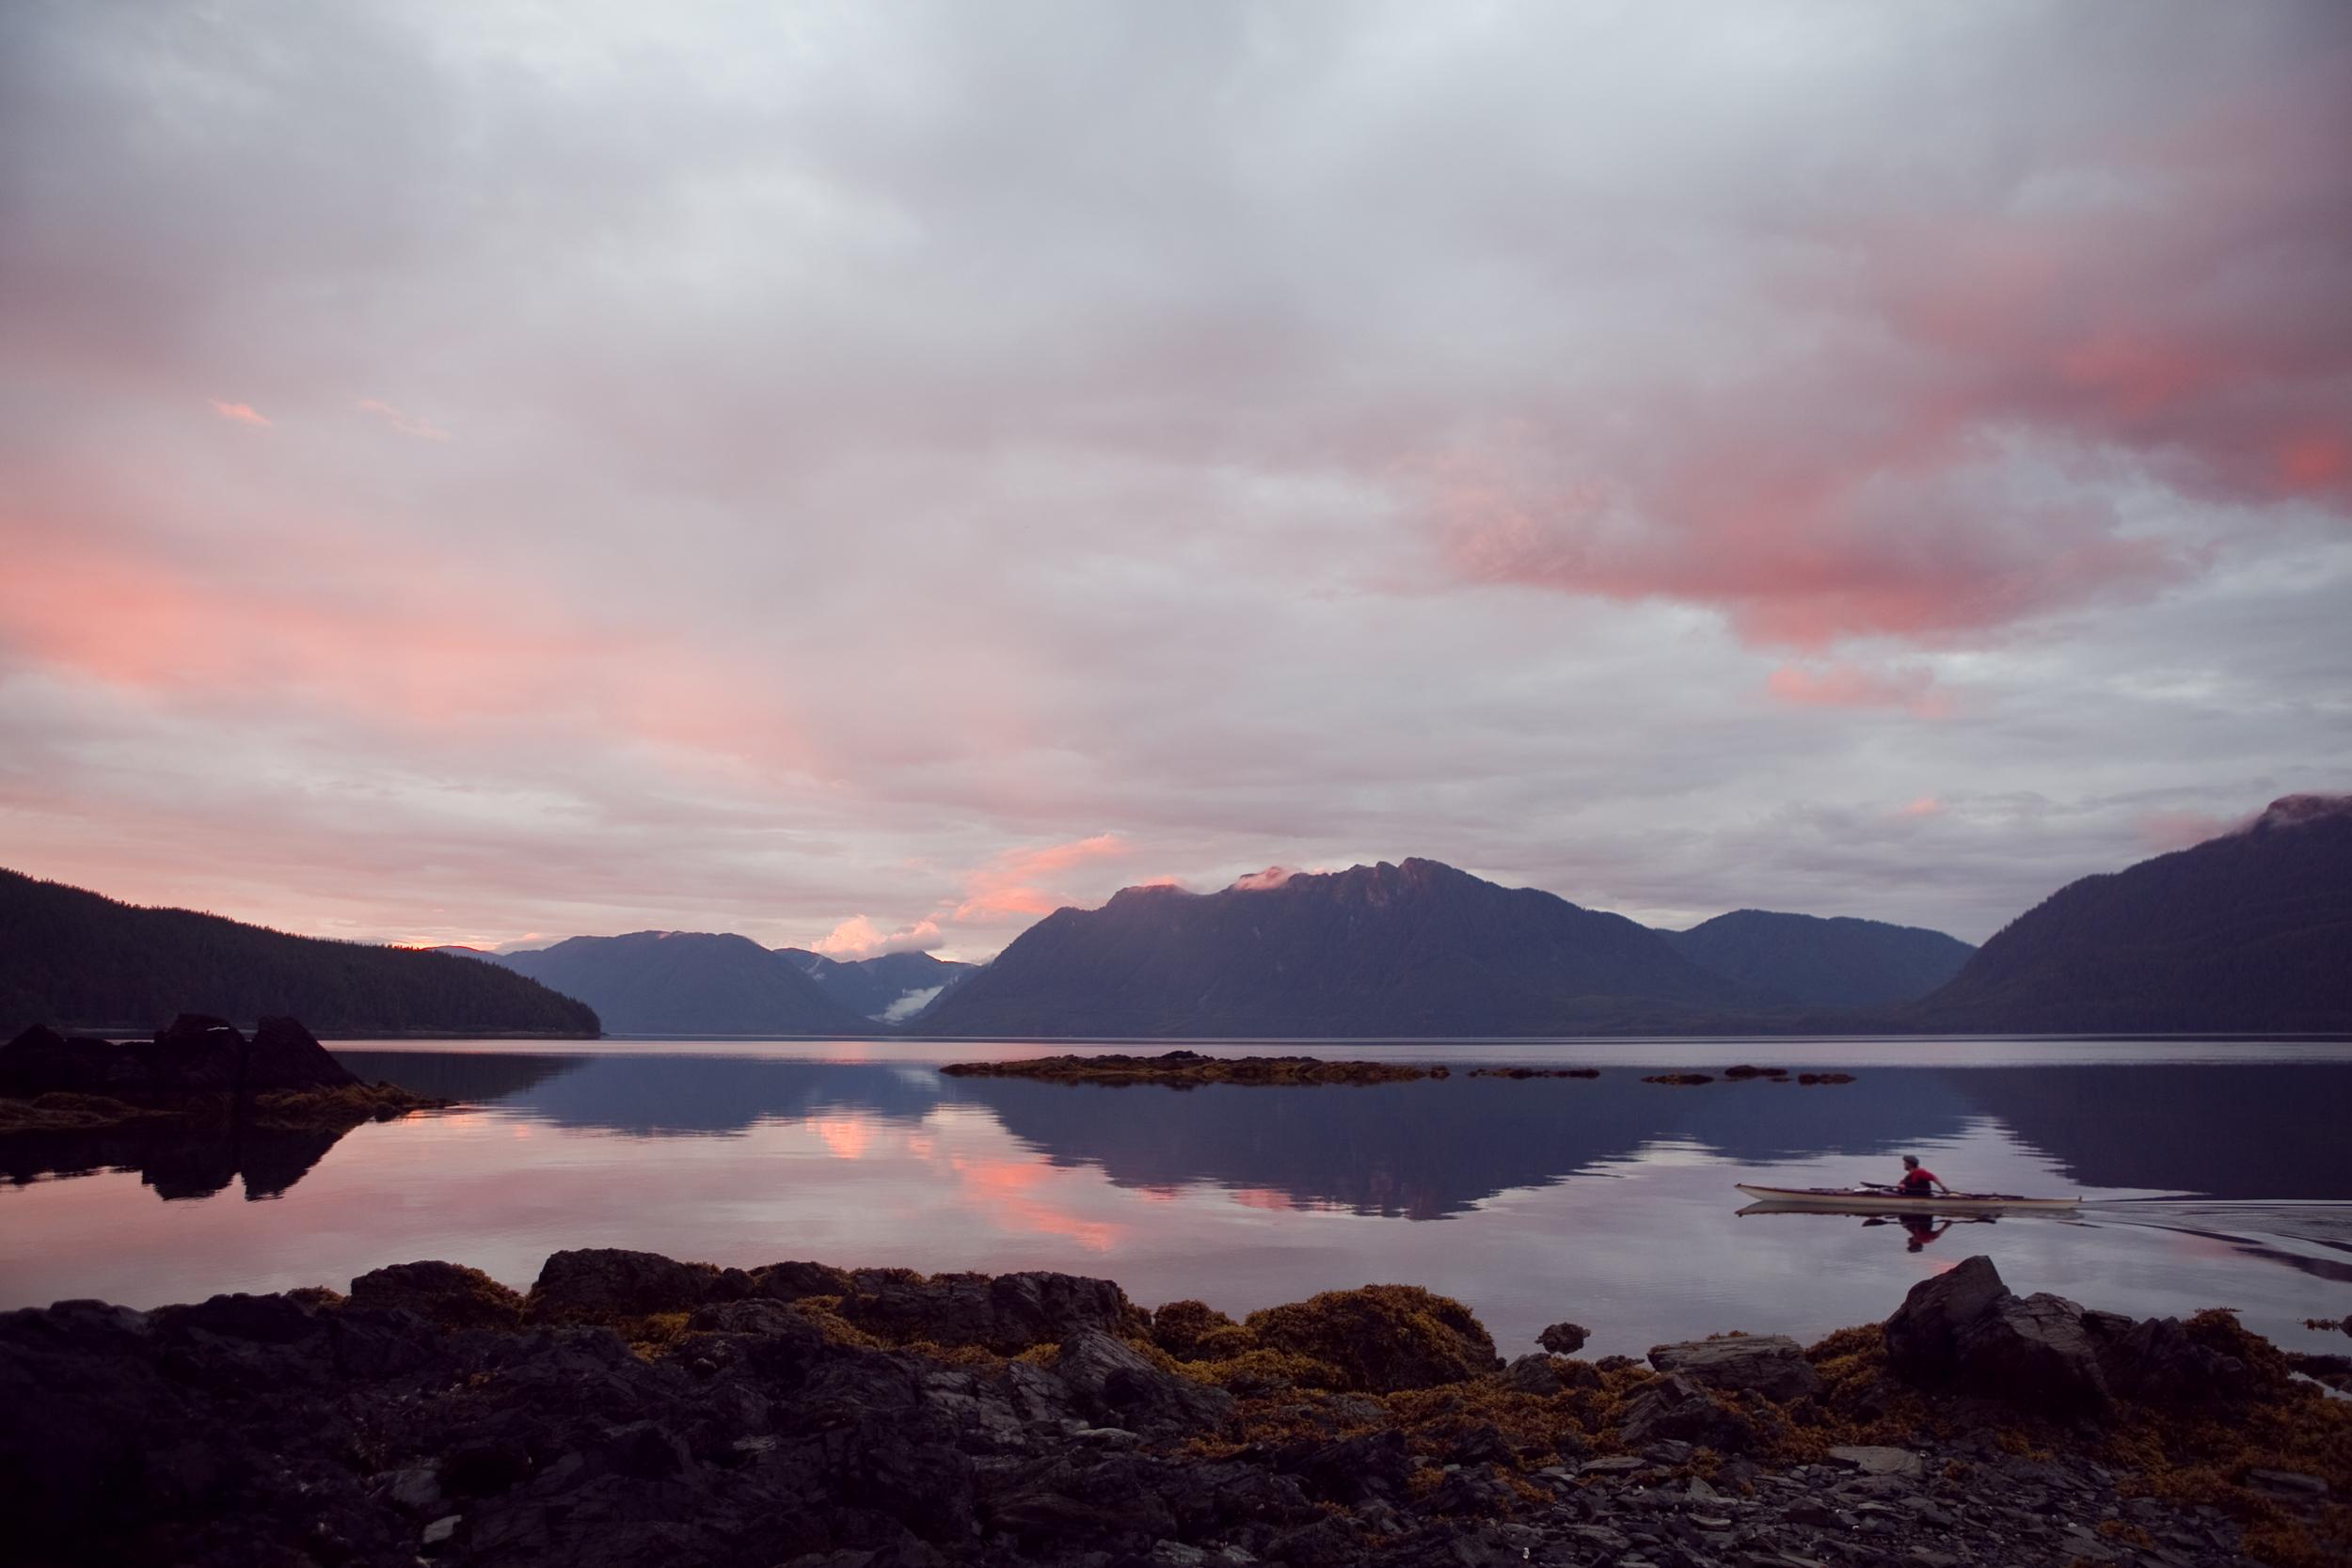 Adam Andis paddles during sunset. South Baranof Island, Alaska.